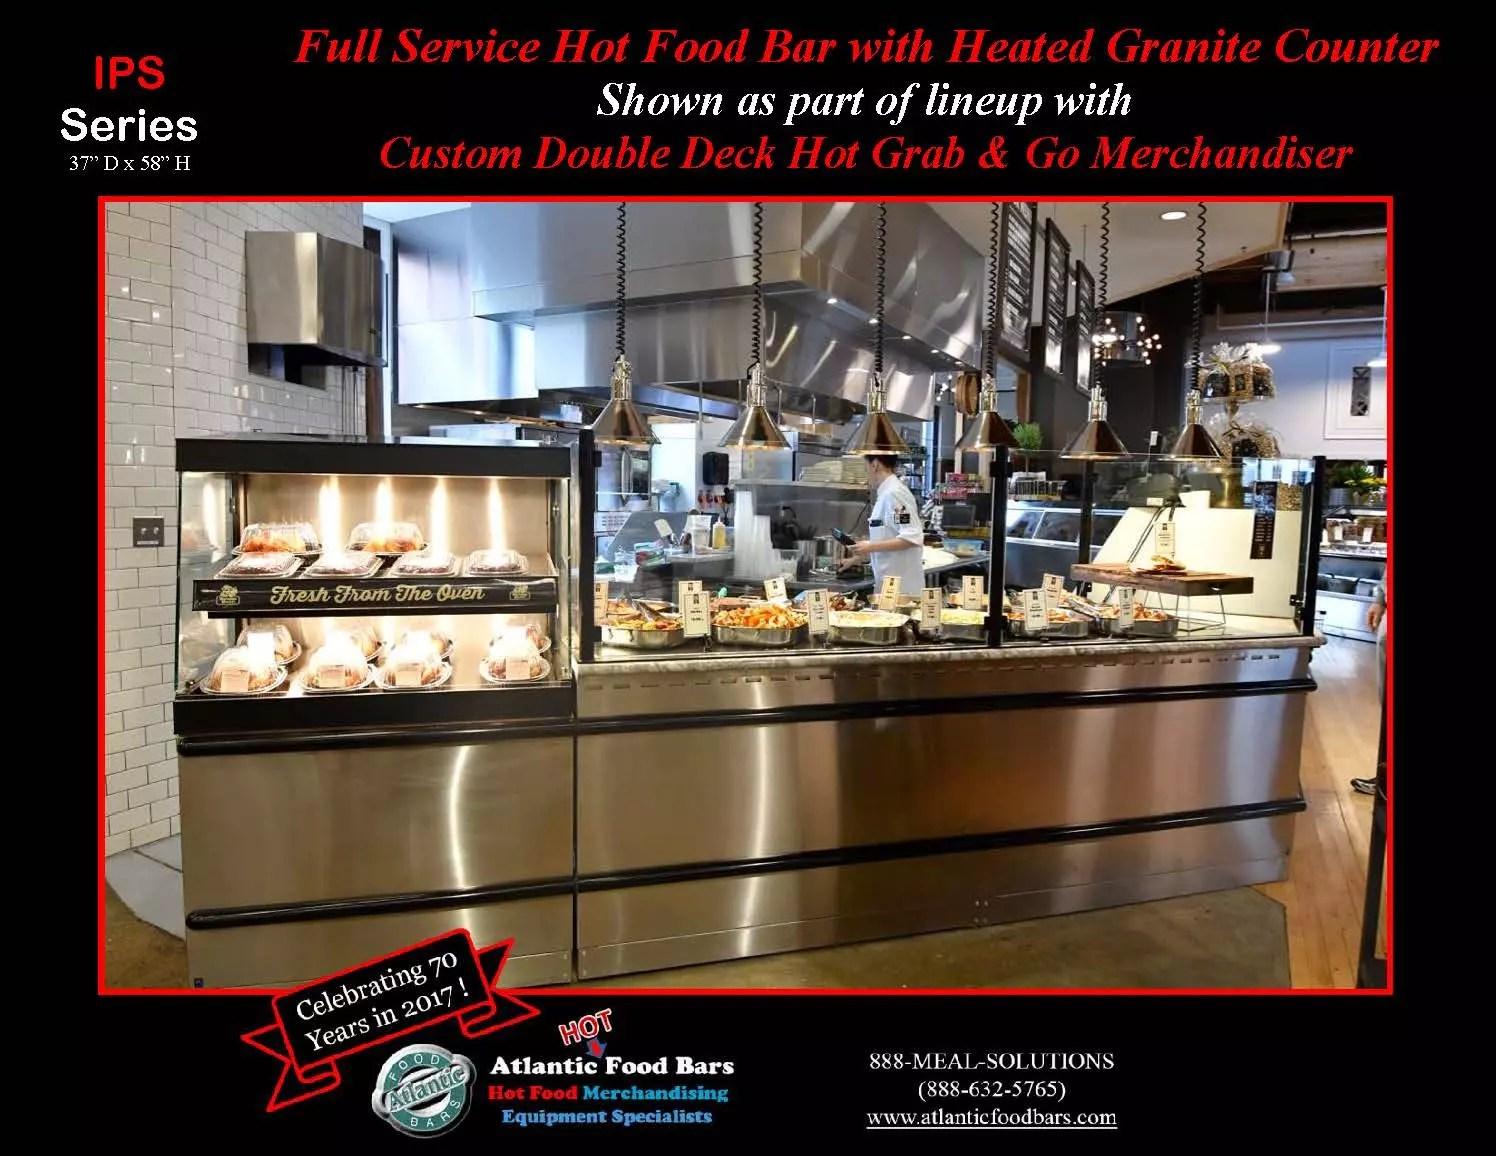 Atlantic Food Bars - Full Service Hot Food Bar with Heated Granite Counter - IPS